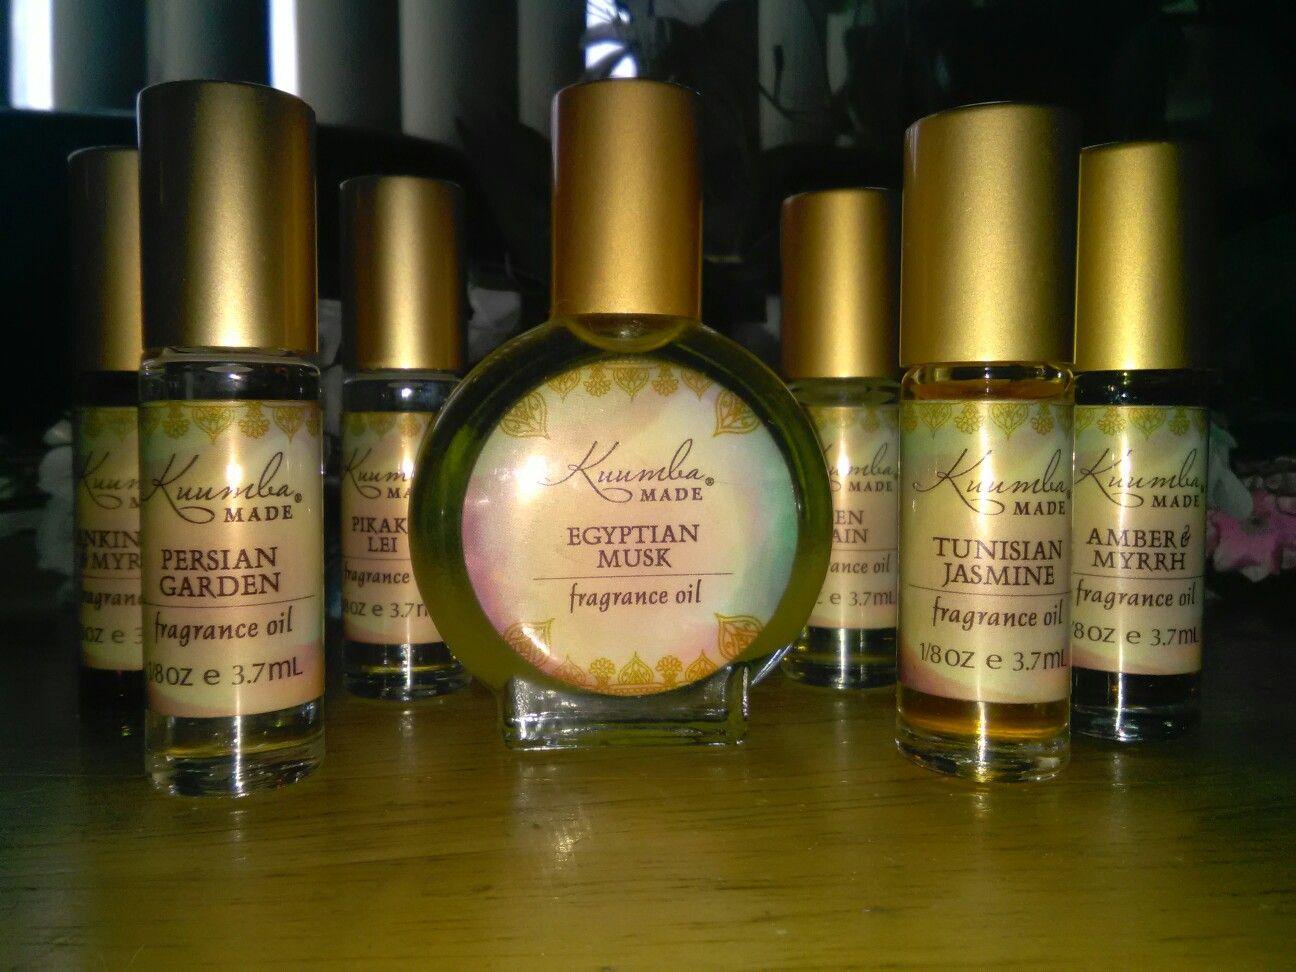 Kuumba Made Persian Garden Fragrance Oil | Fragrance oil, Persian ...